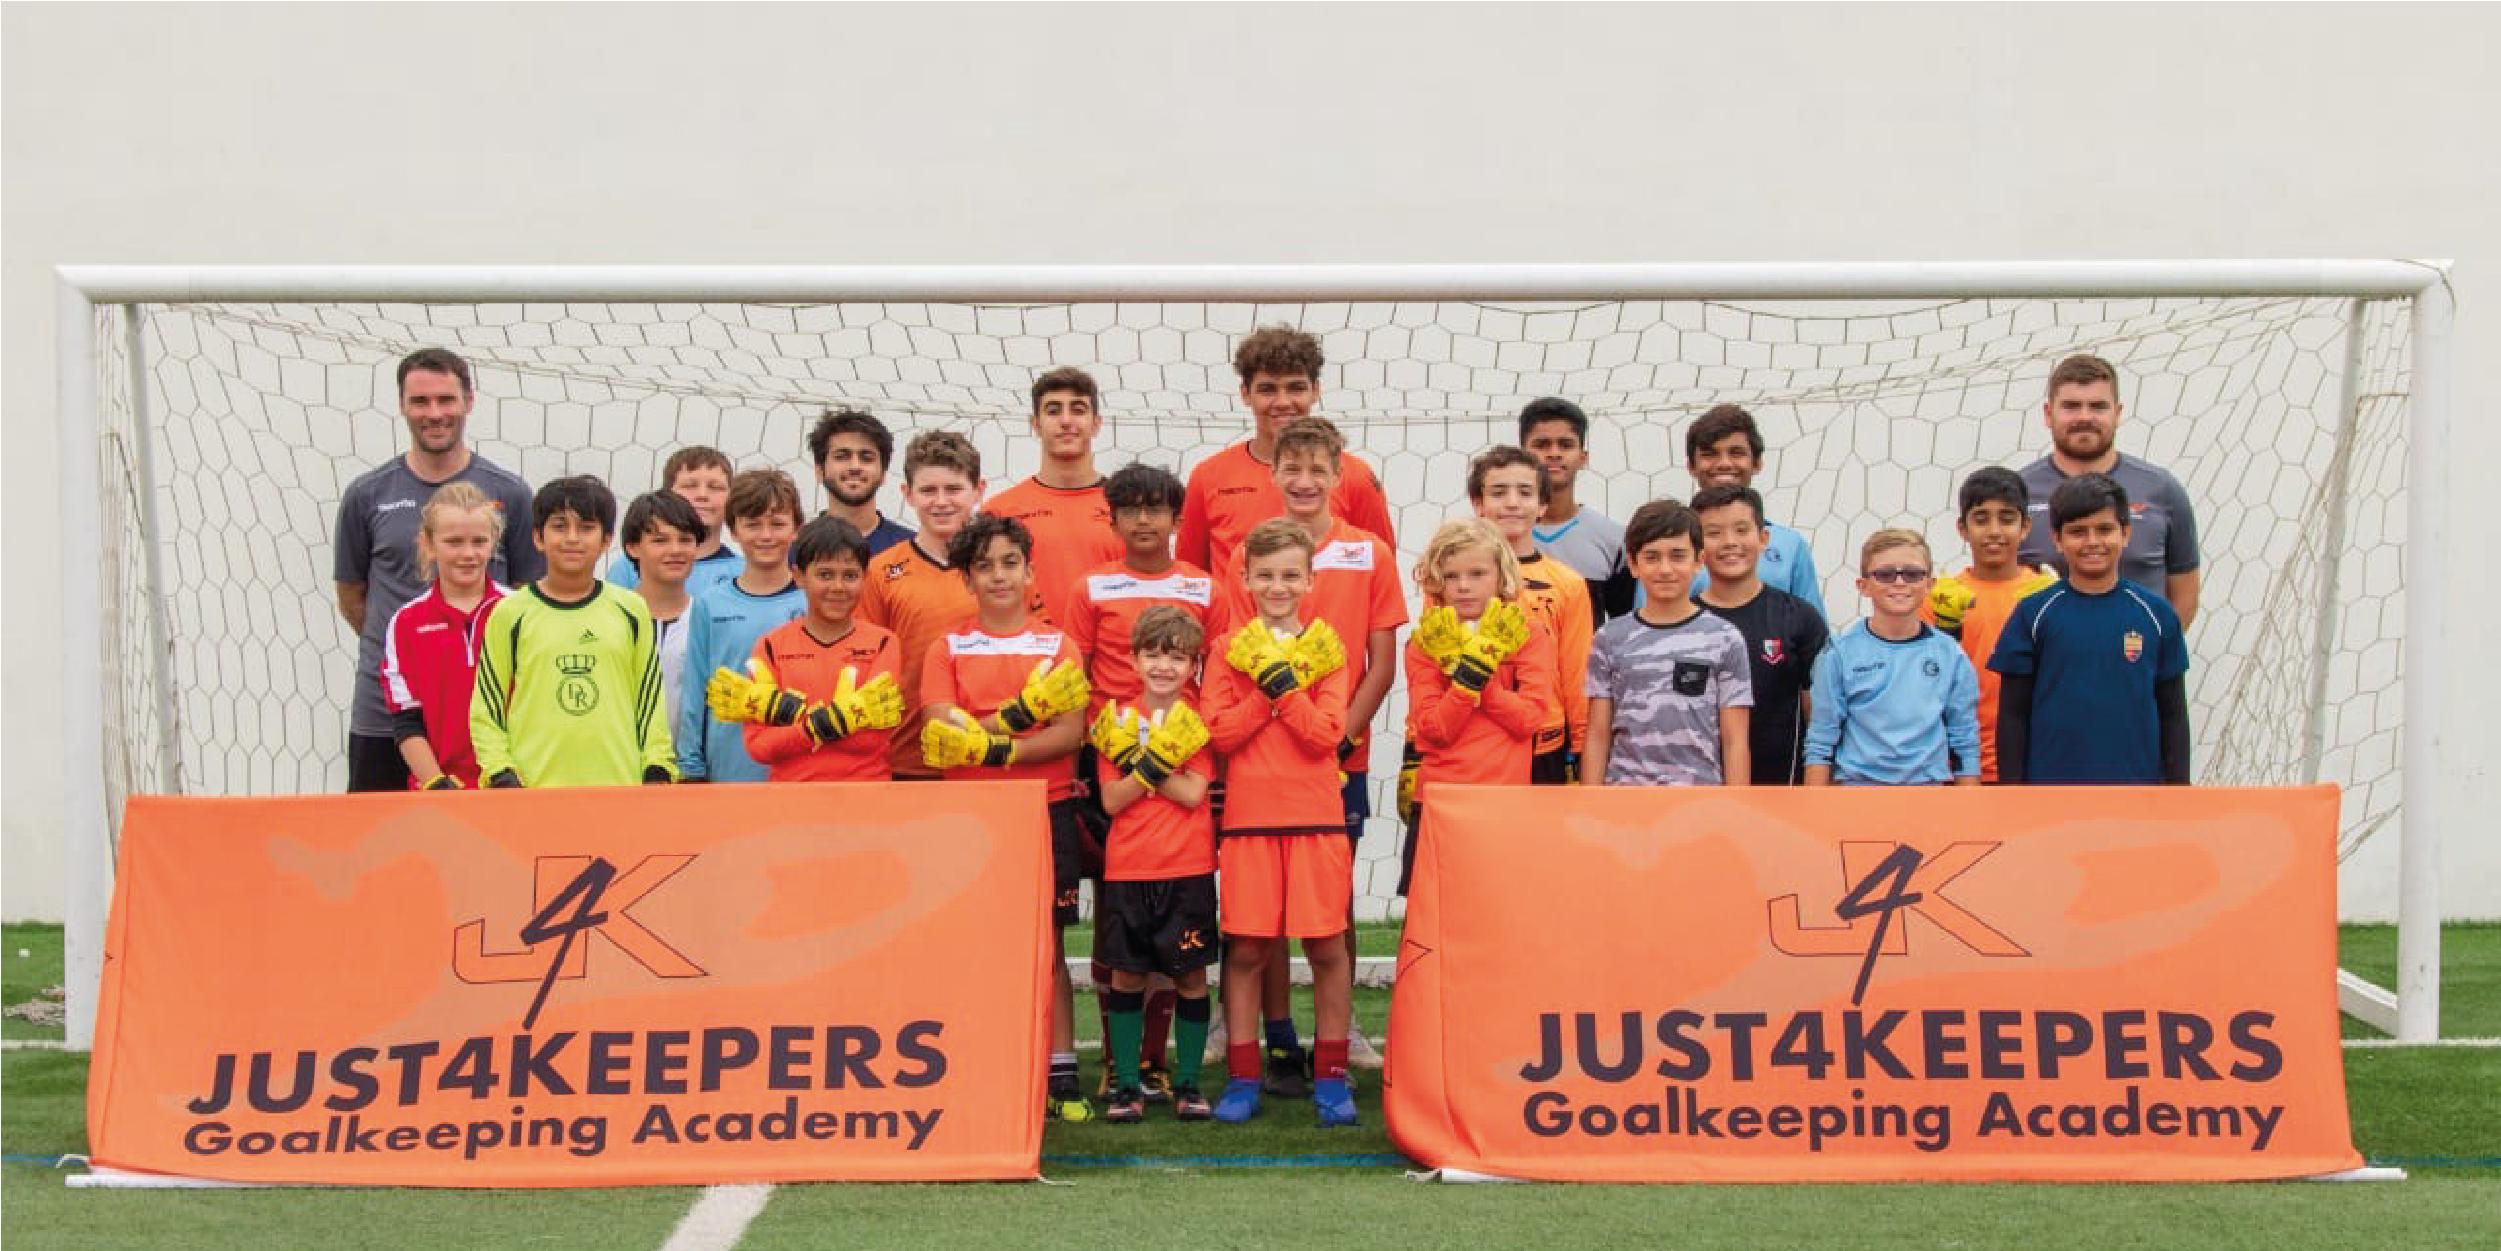 Goalkeeper camps